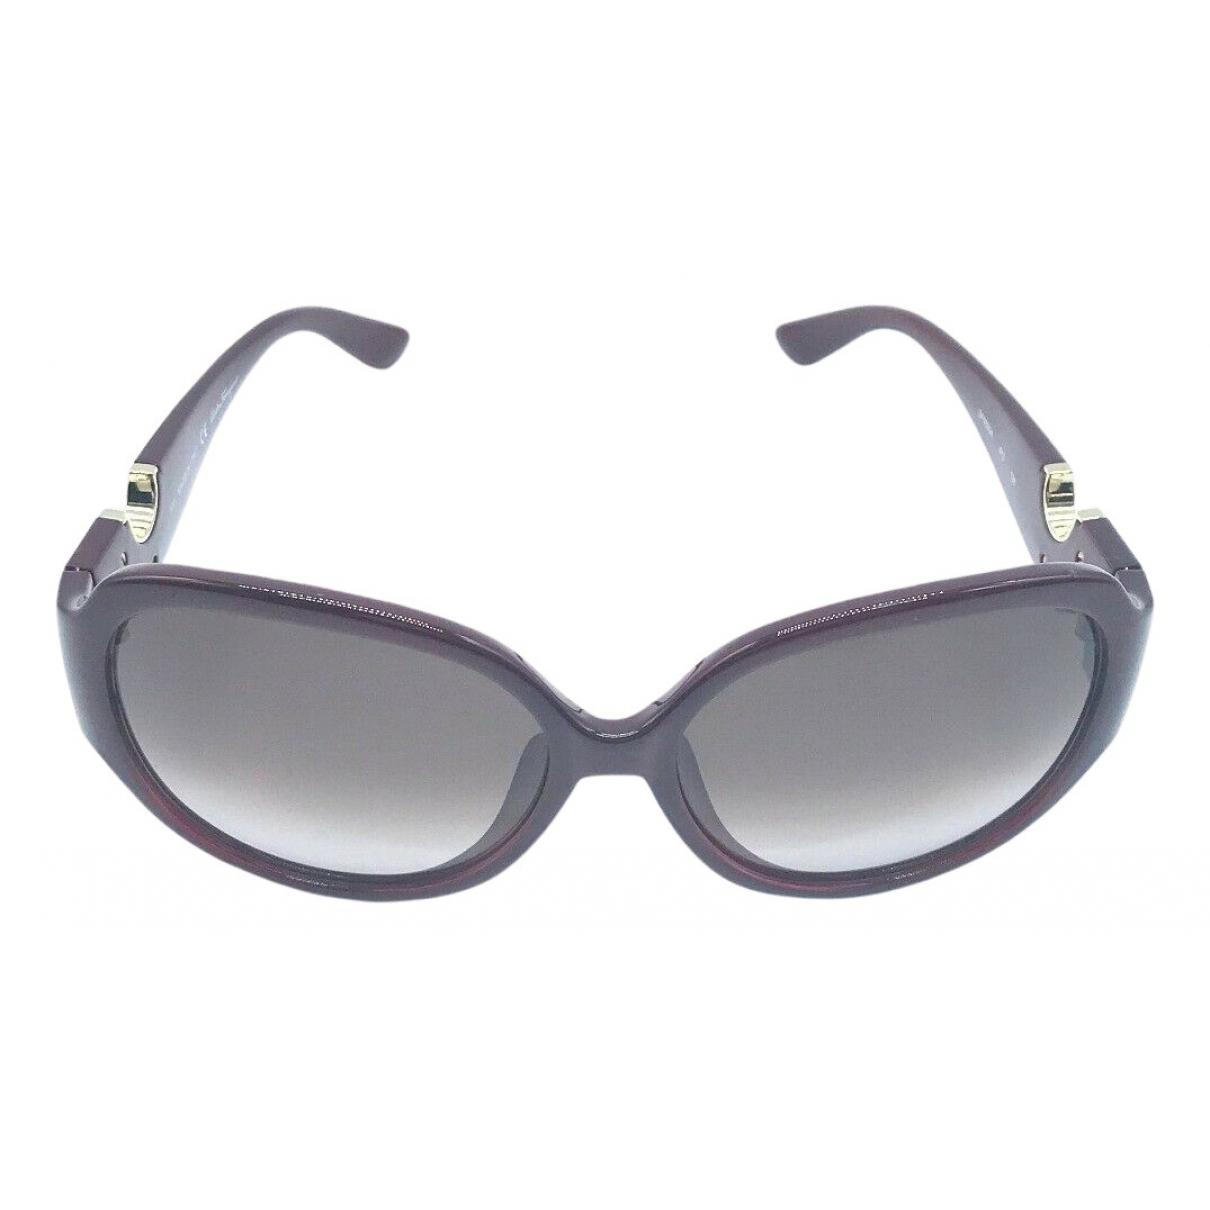 Salvatore Ferragamo N Sunglasses for Women N